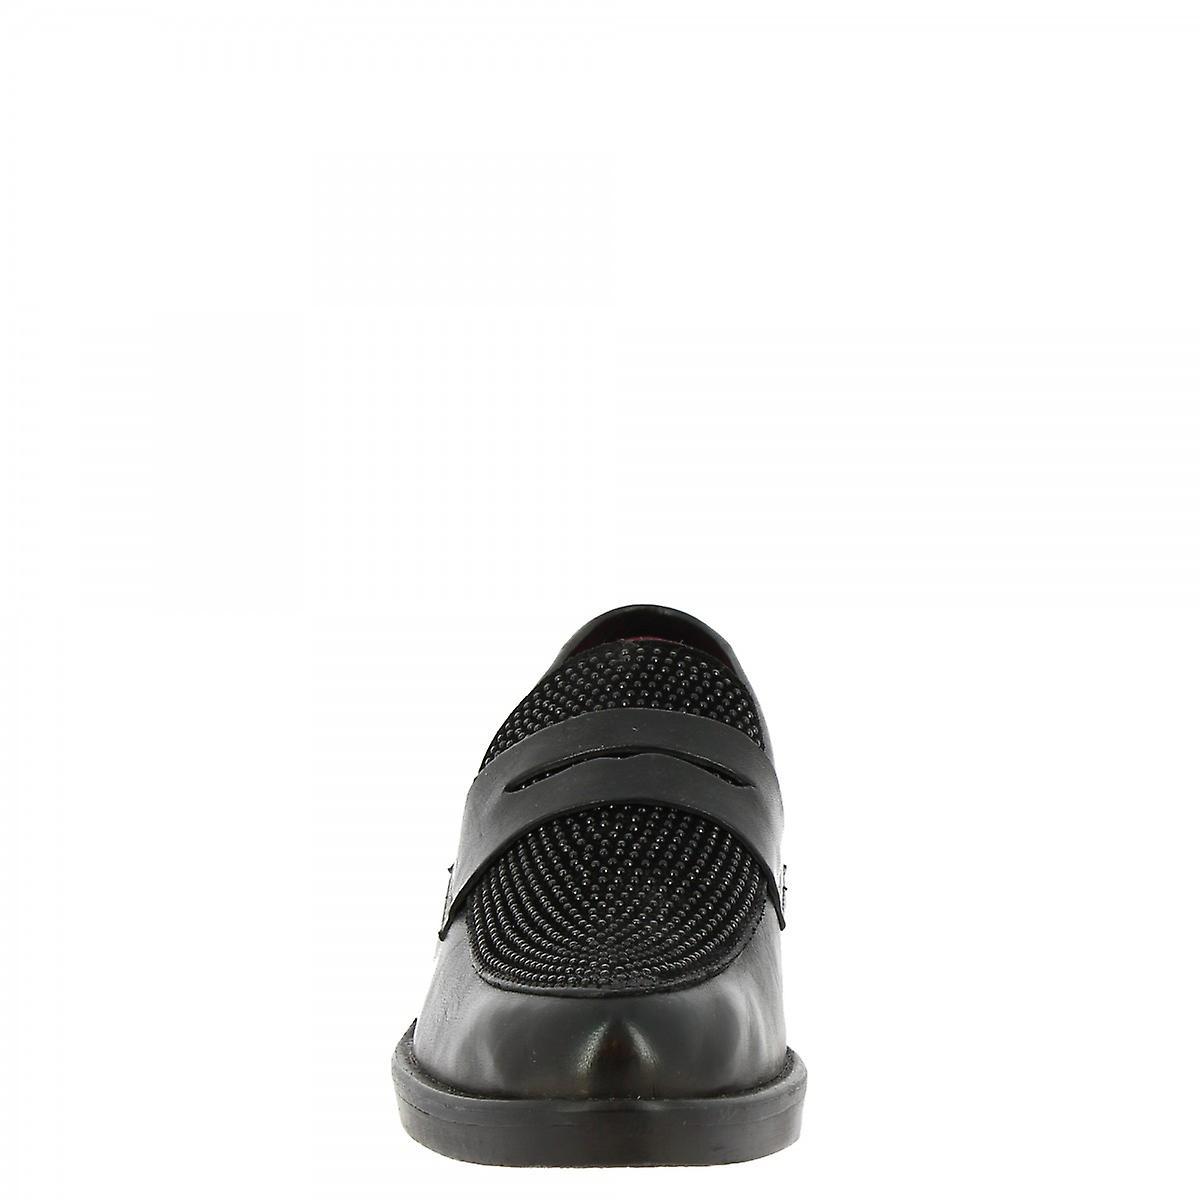 Leonardo Shoes Women's handmade elegant slip on loafers shoes black calf leather qjDAZ